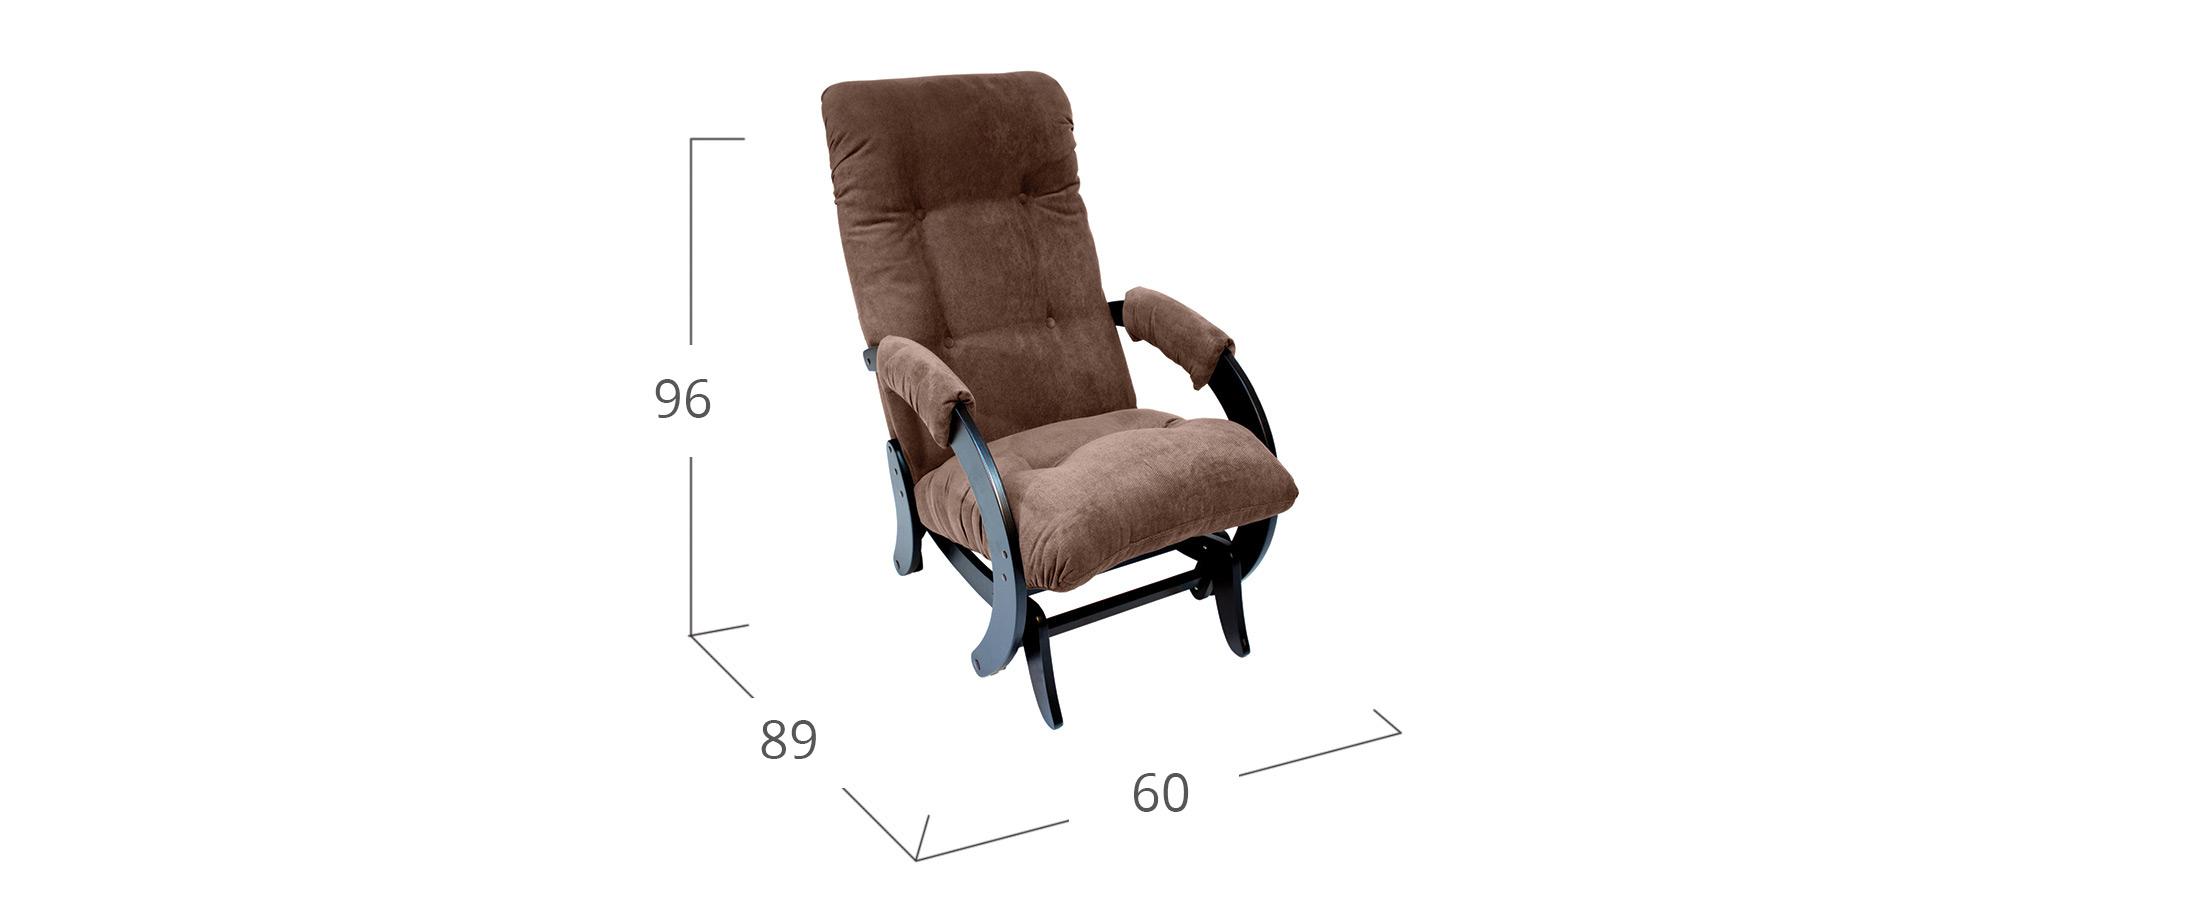 Кресло-гляйдер 68 VeronaBrown Венге